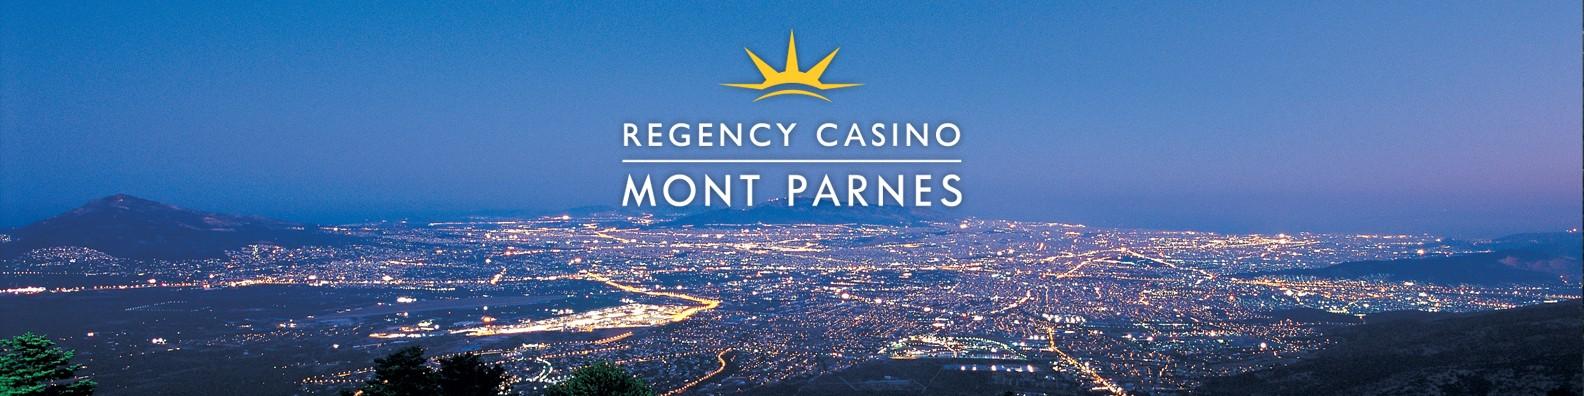 Regency casino mont parnes sega genesis fighting game list